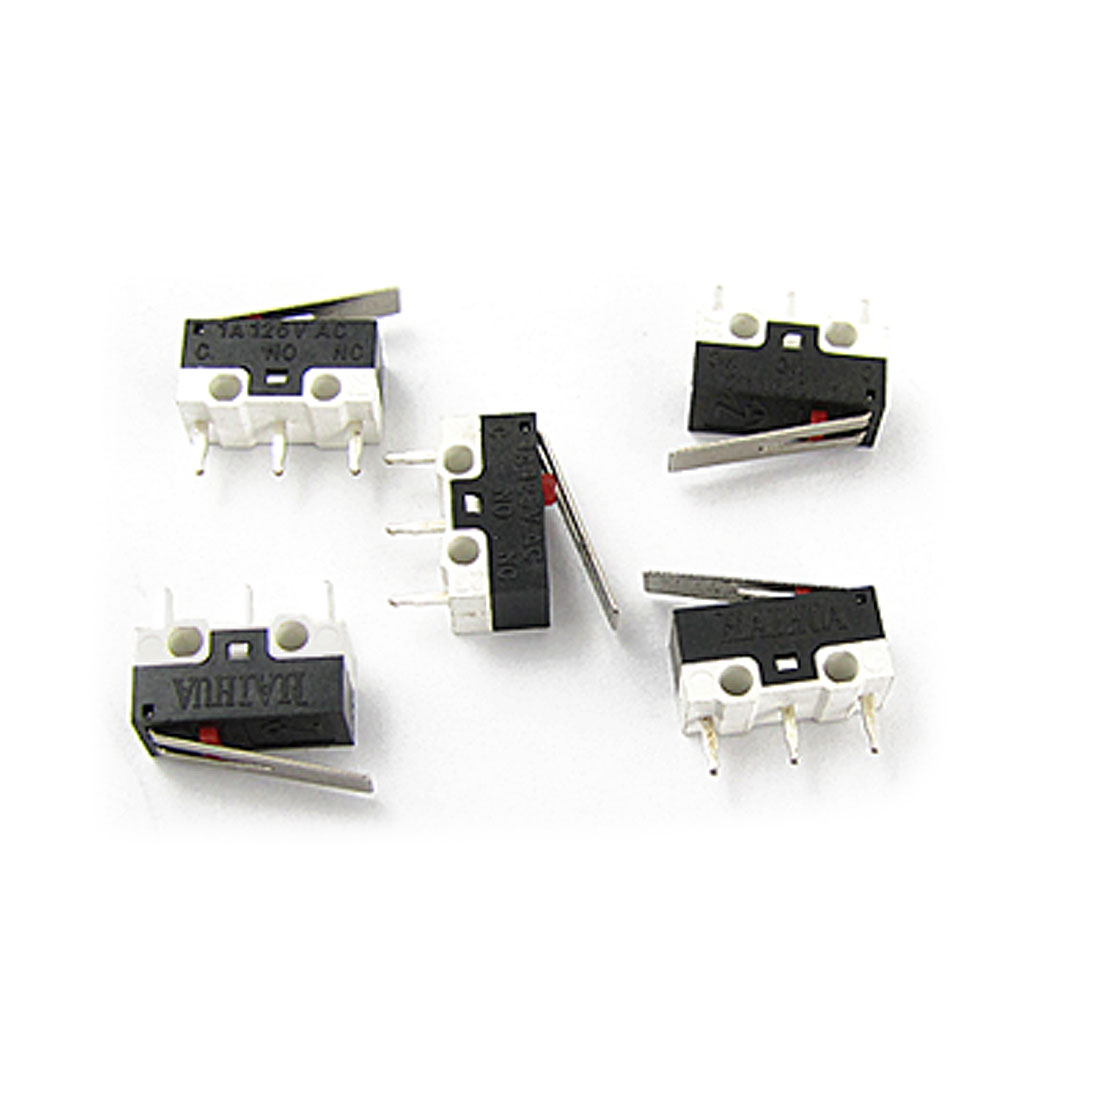 AC 125V 1A 1NO 1NC Mini Micro Switch w Lever 5 Pieces